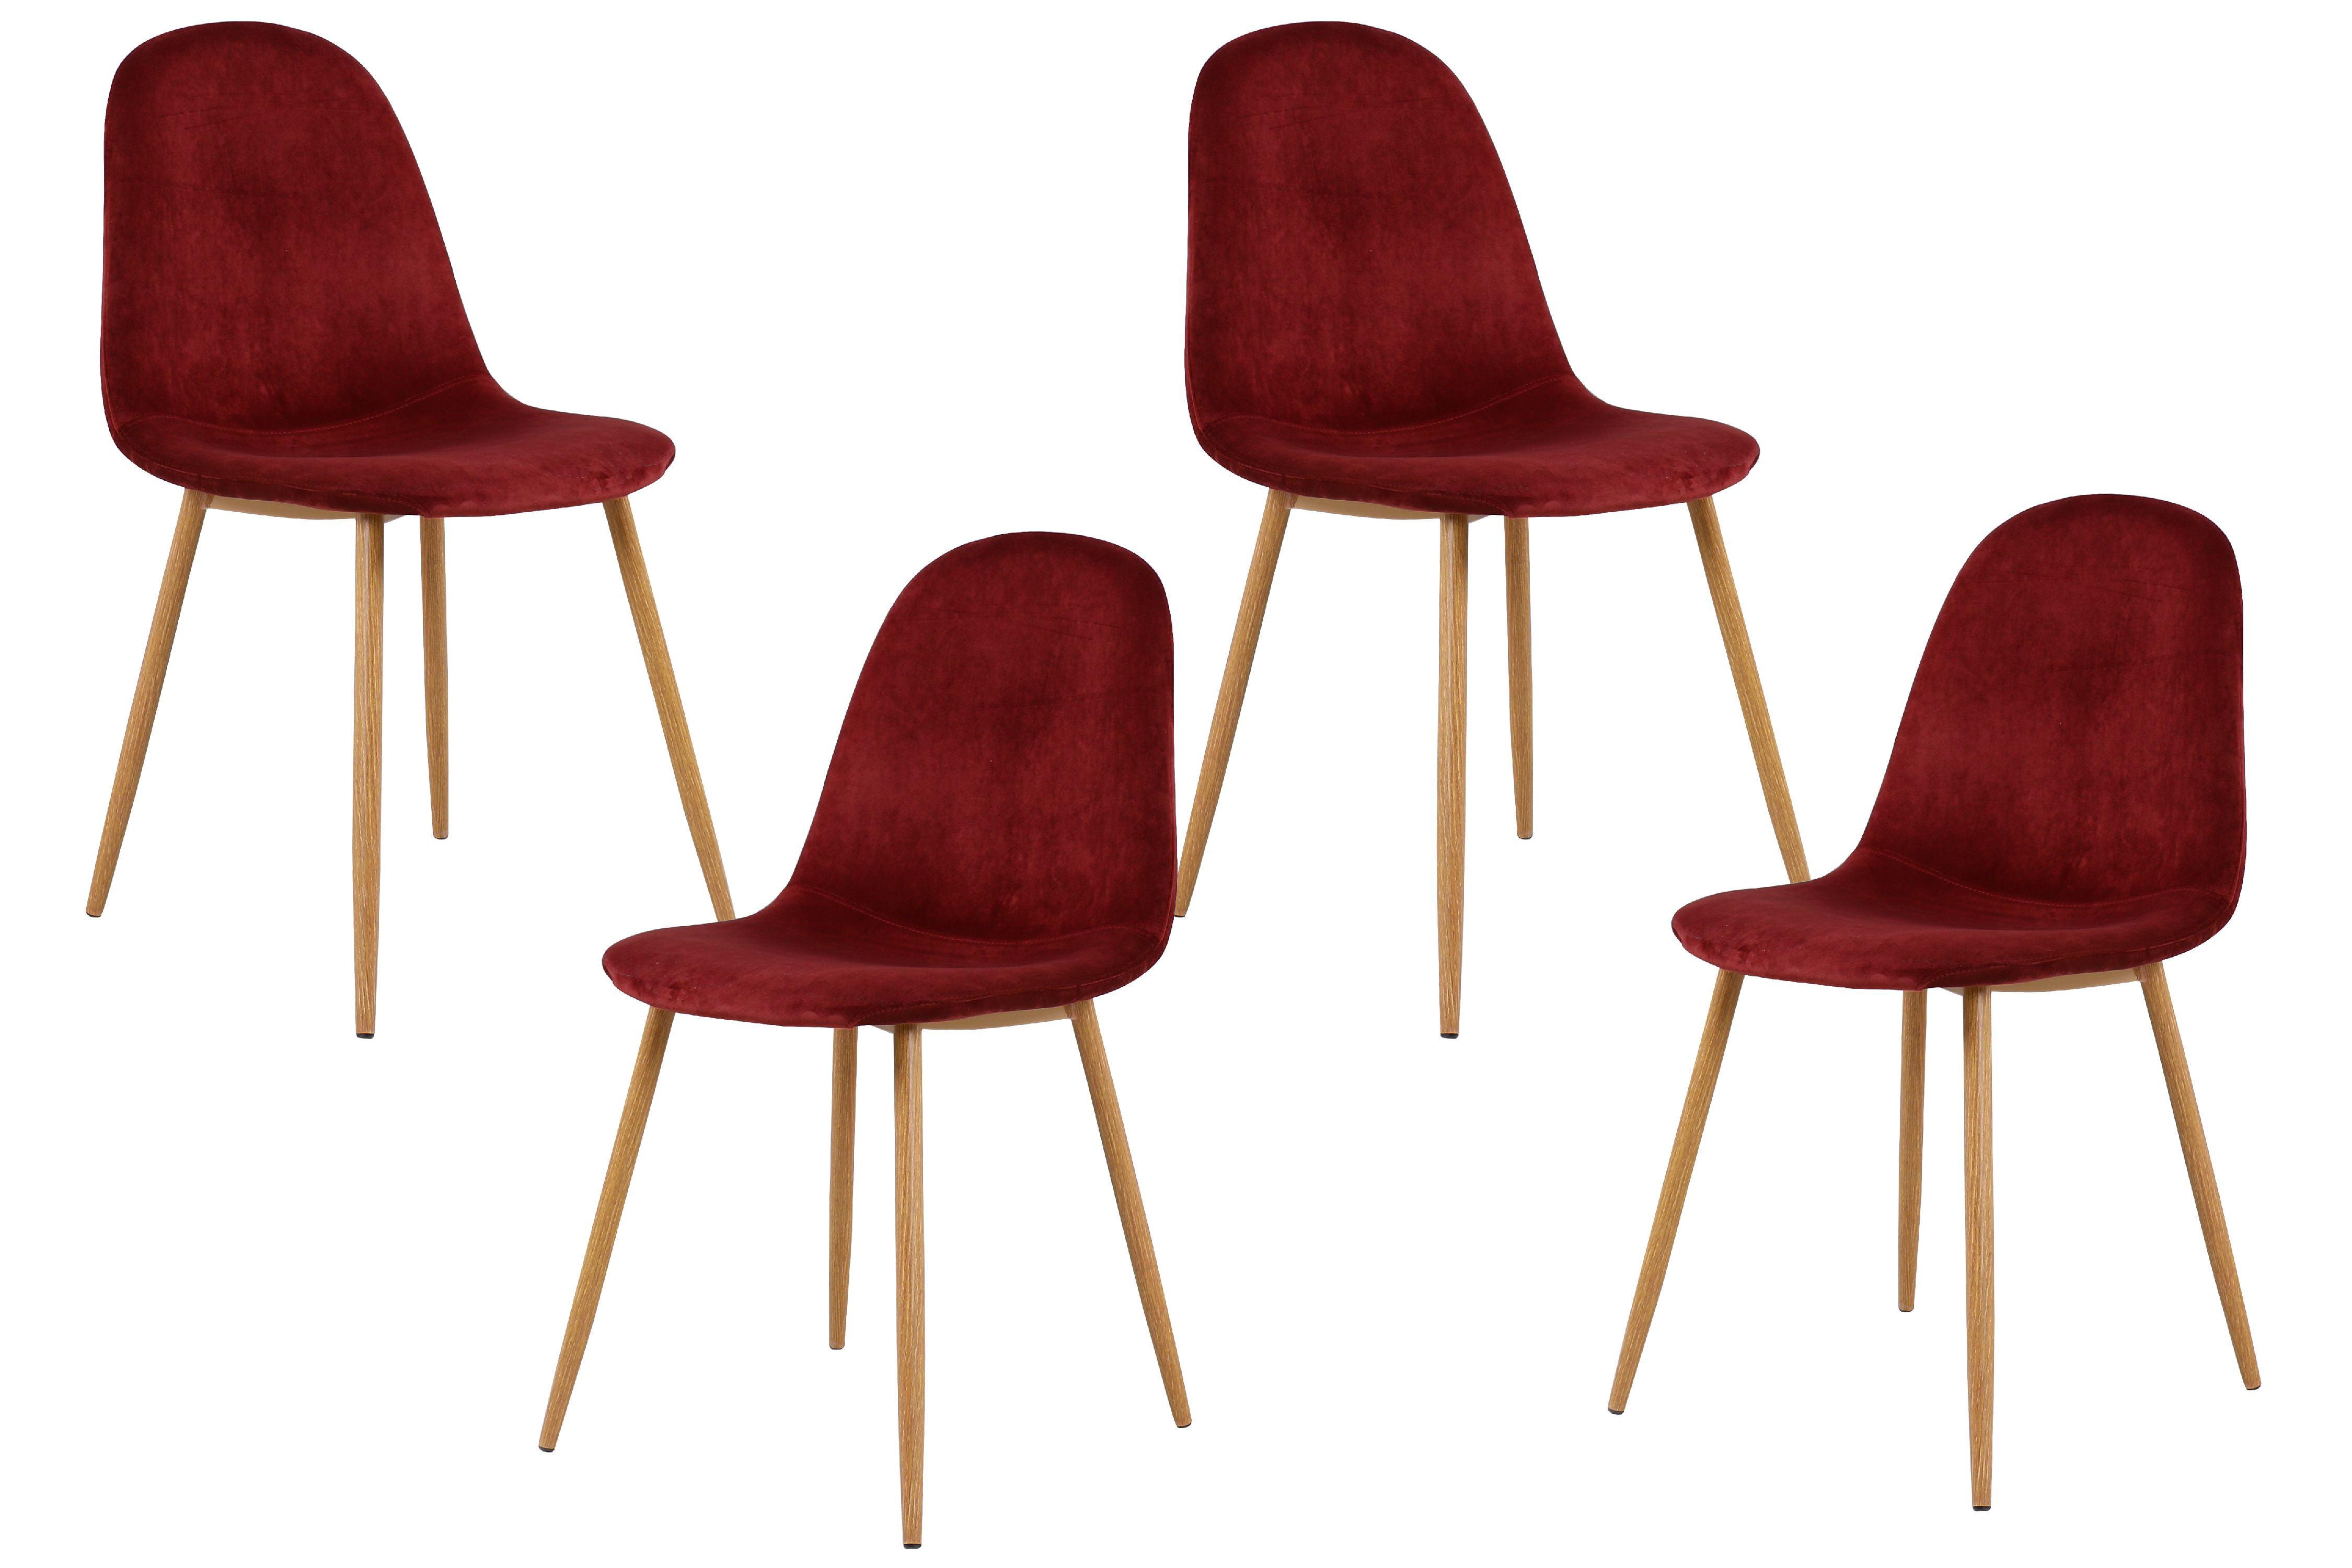 Best Master Furniture Morgan Velvet Side Chairs Set Of 4 Burgundy Walmart Com Walmart Com